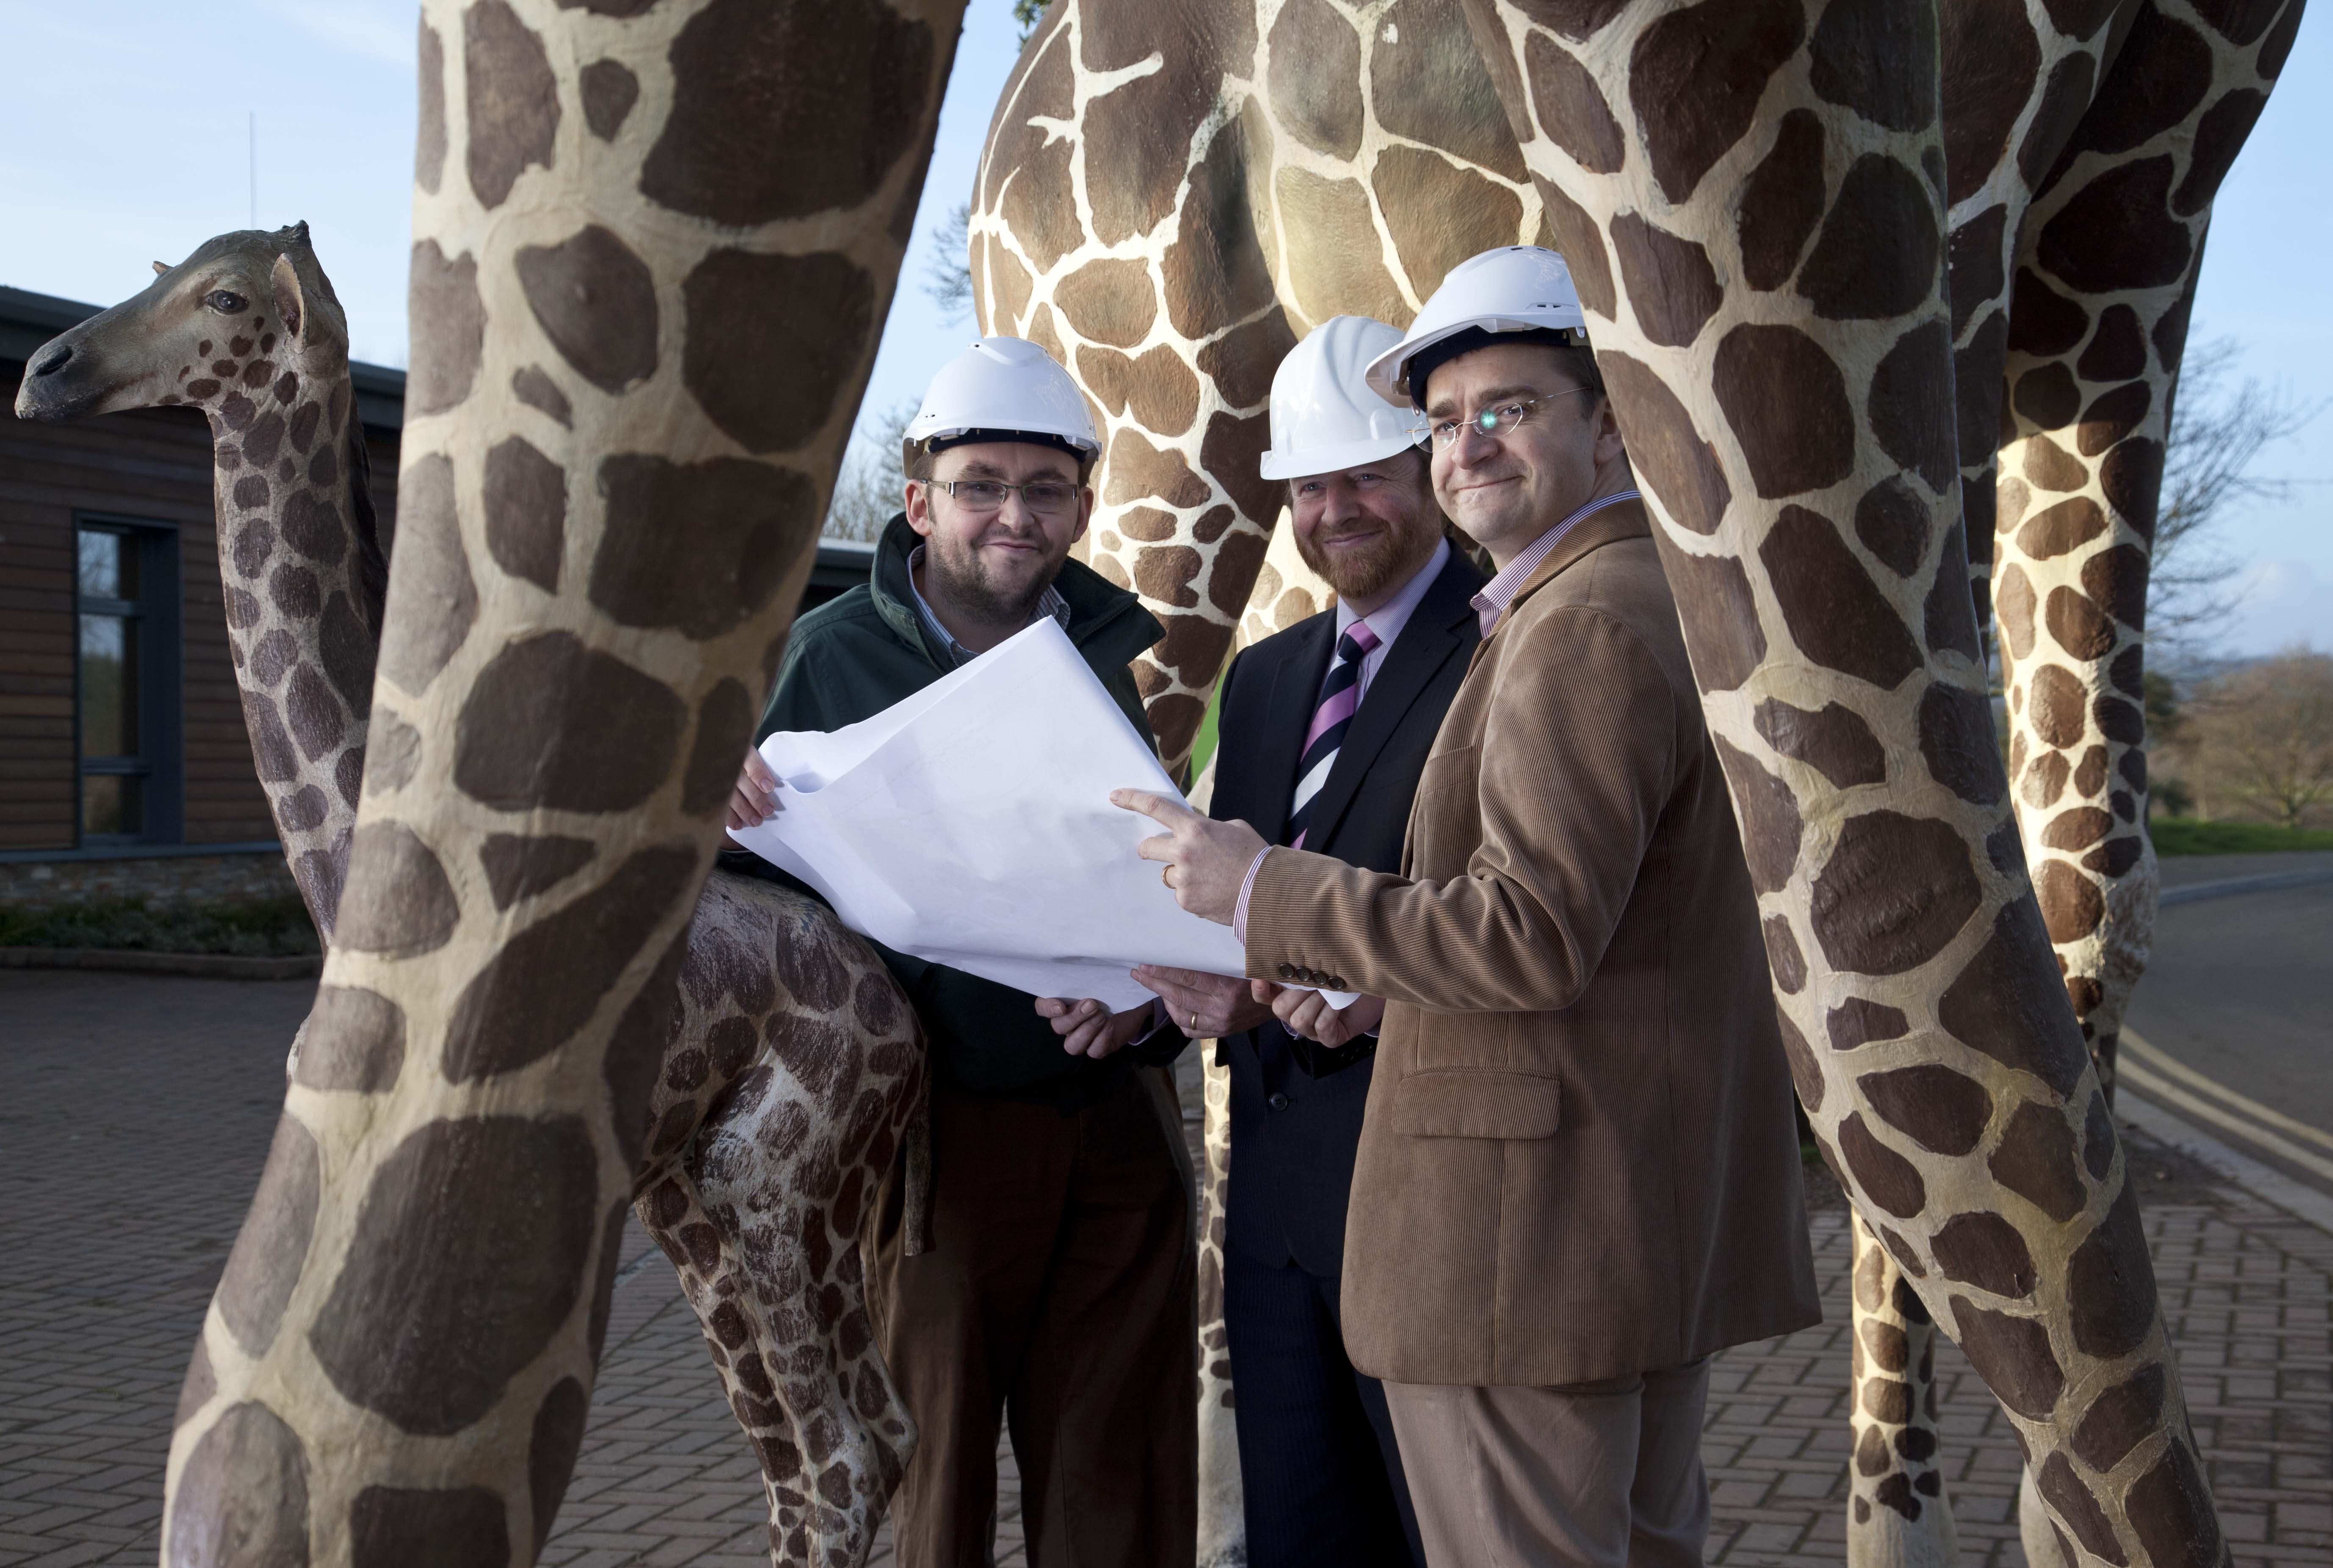 SECAD Investment Funds New Development at Fota Wildlife Park